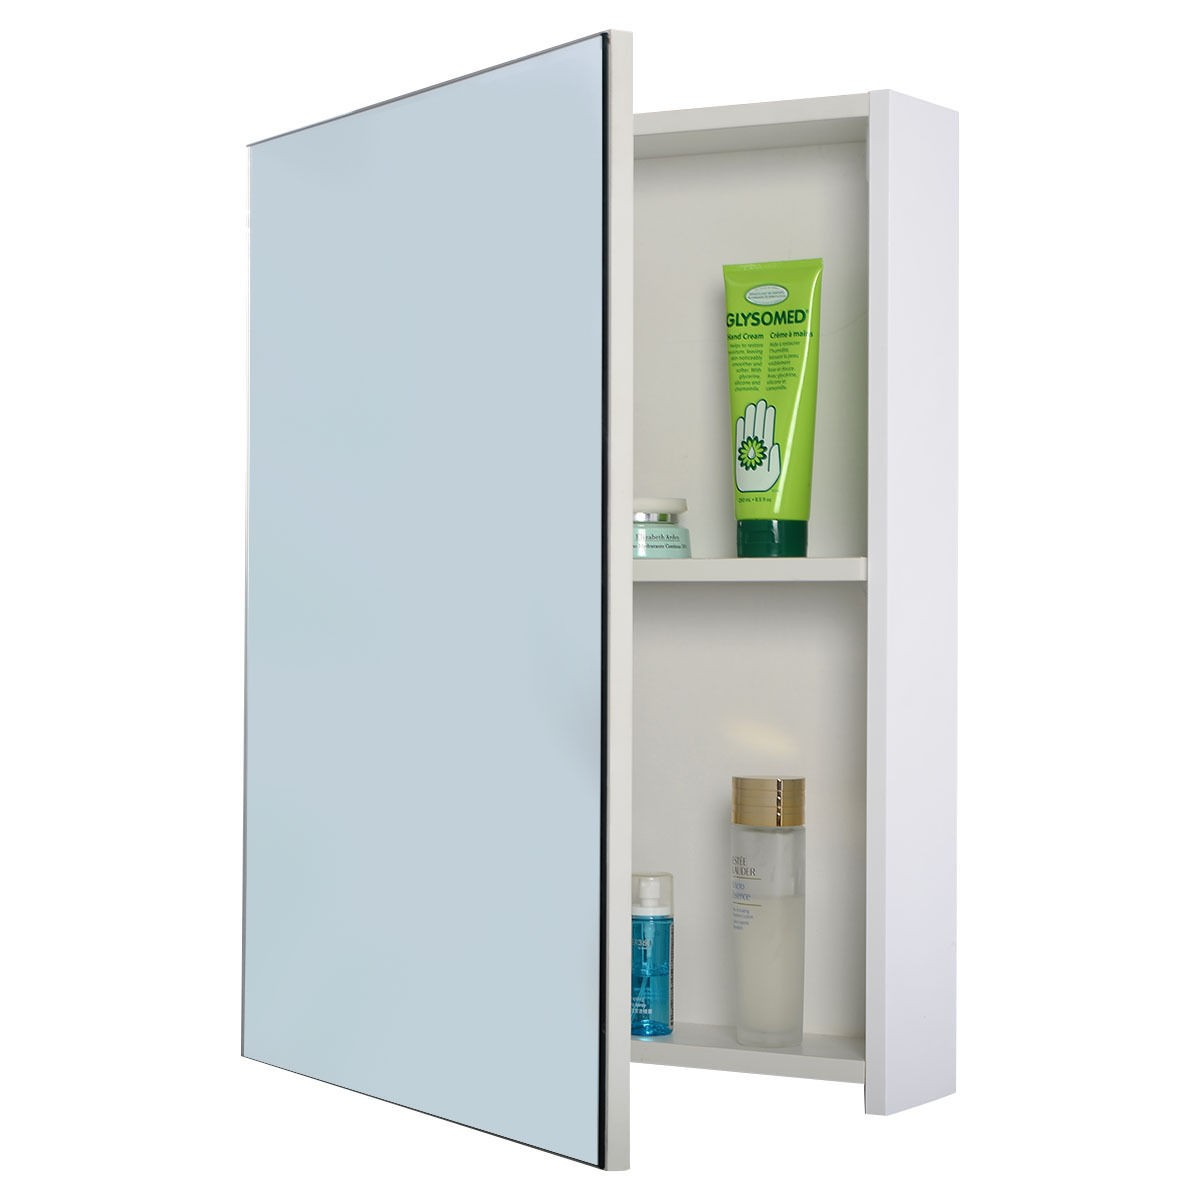 3 mirror door 36 20 wide wall mount mirrored bathroom for Bathroom cabinets long